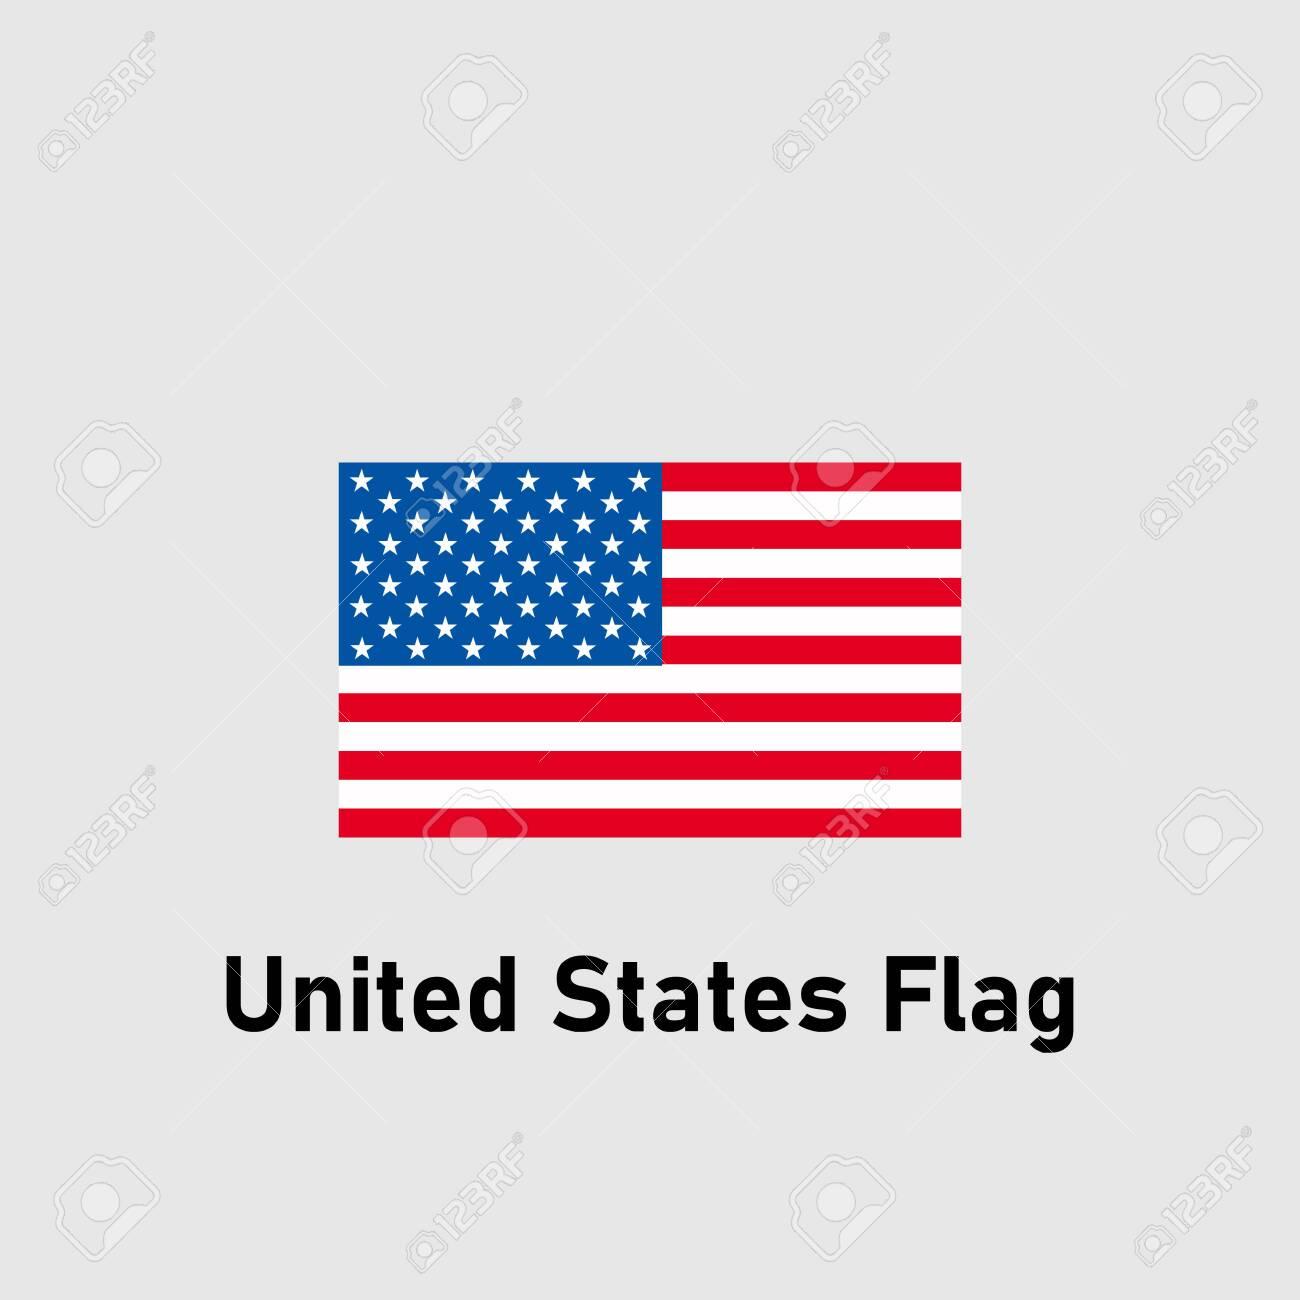 USA Flag. Flag of United States. Isolated vector illustration. - 139891742